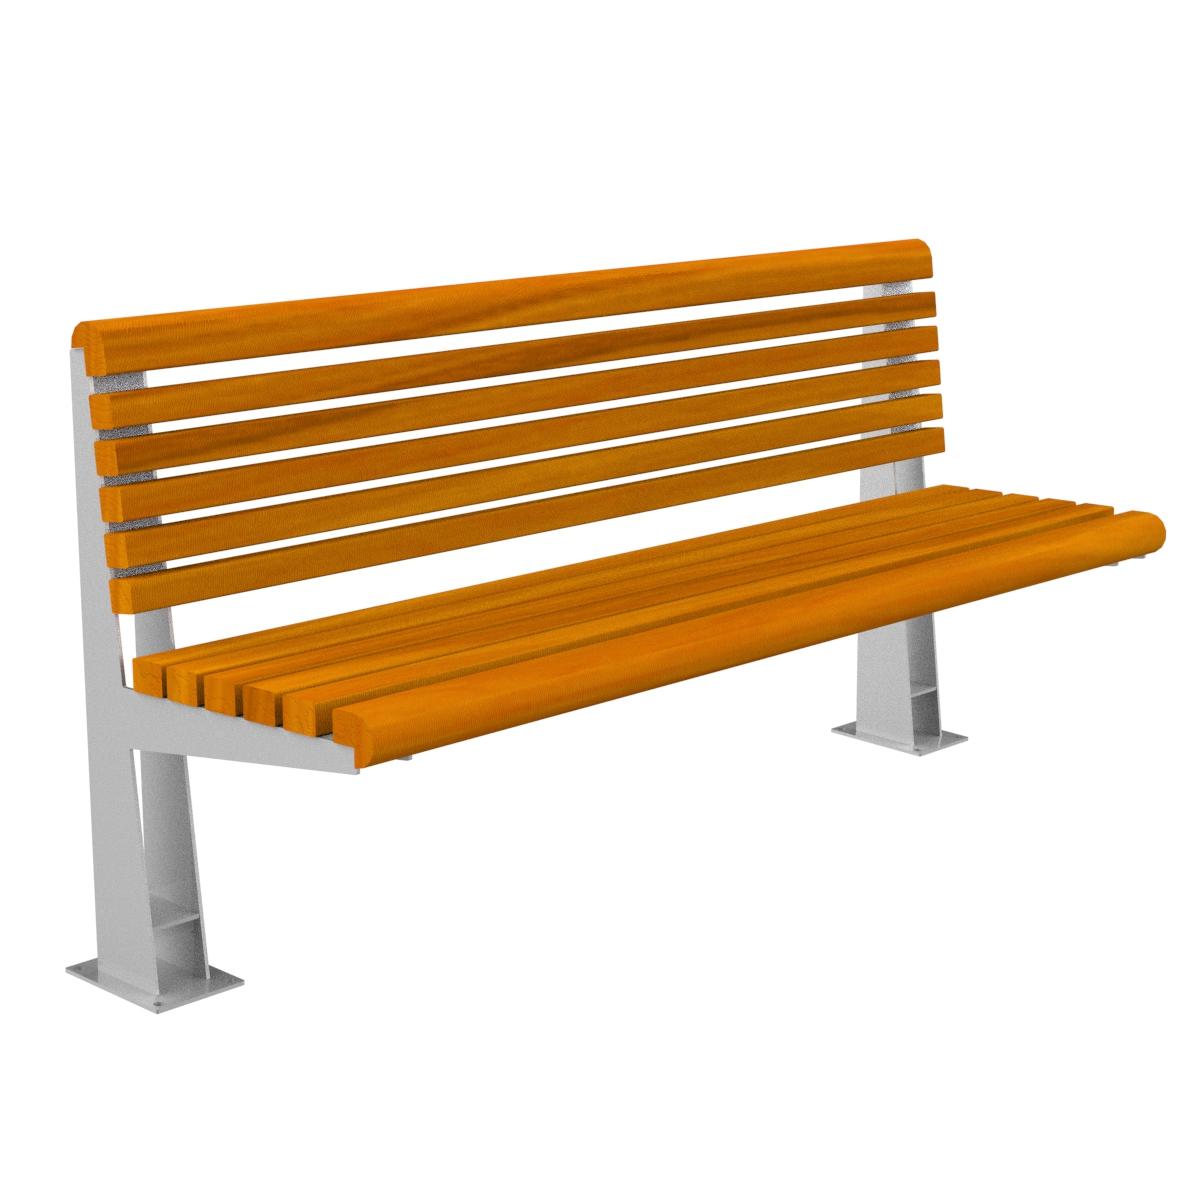 Banco madera ronda mobiliario urbano para sentarse parques for Banco madera jardin